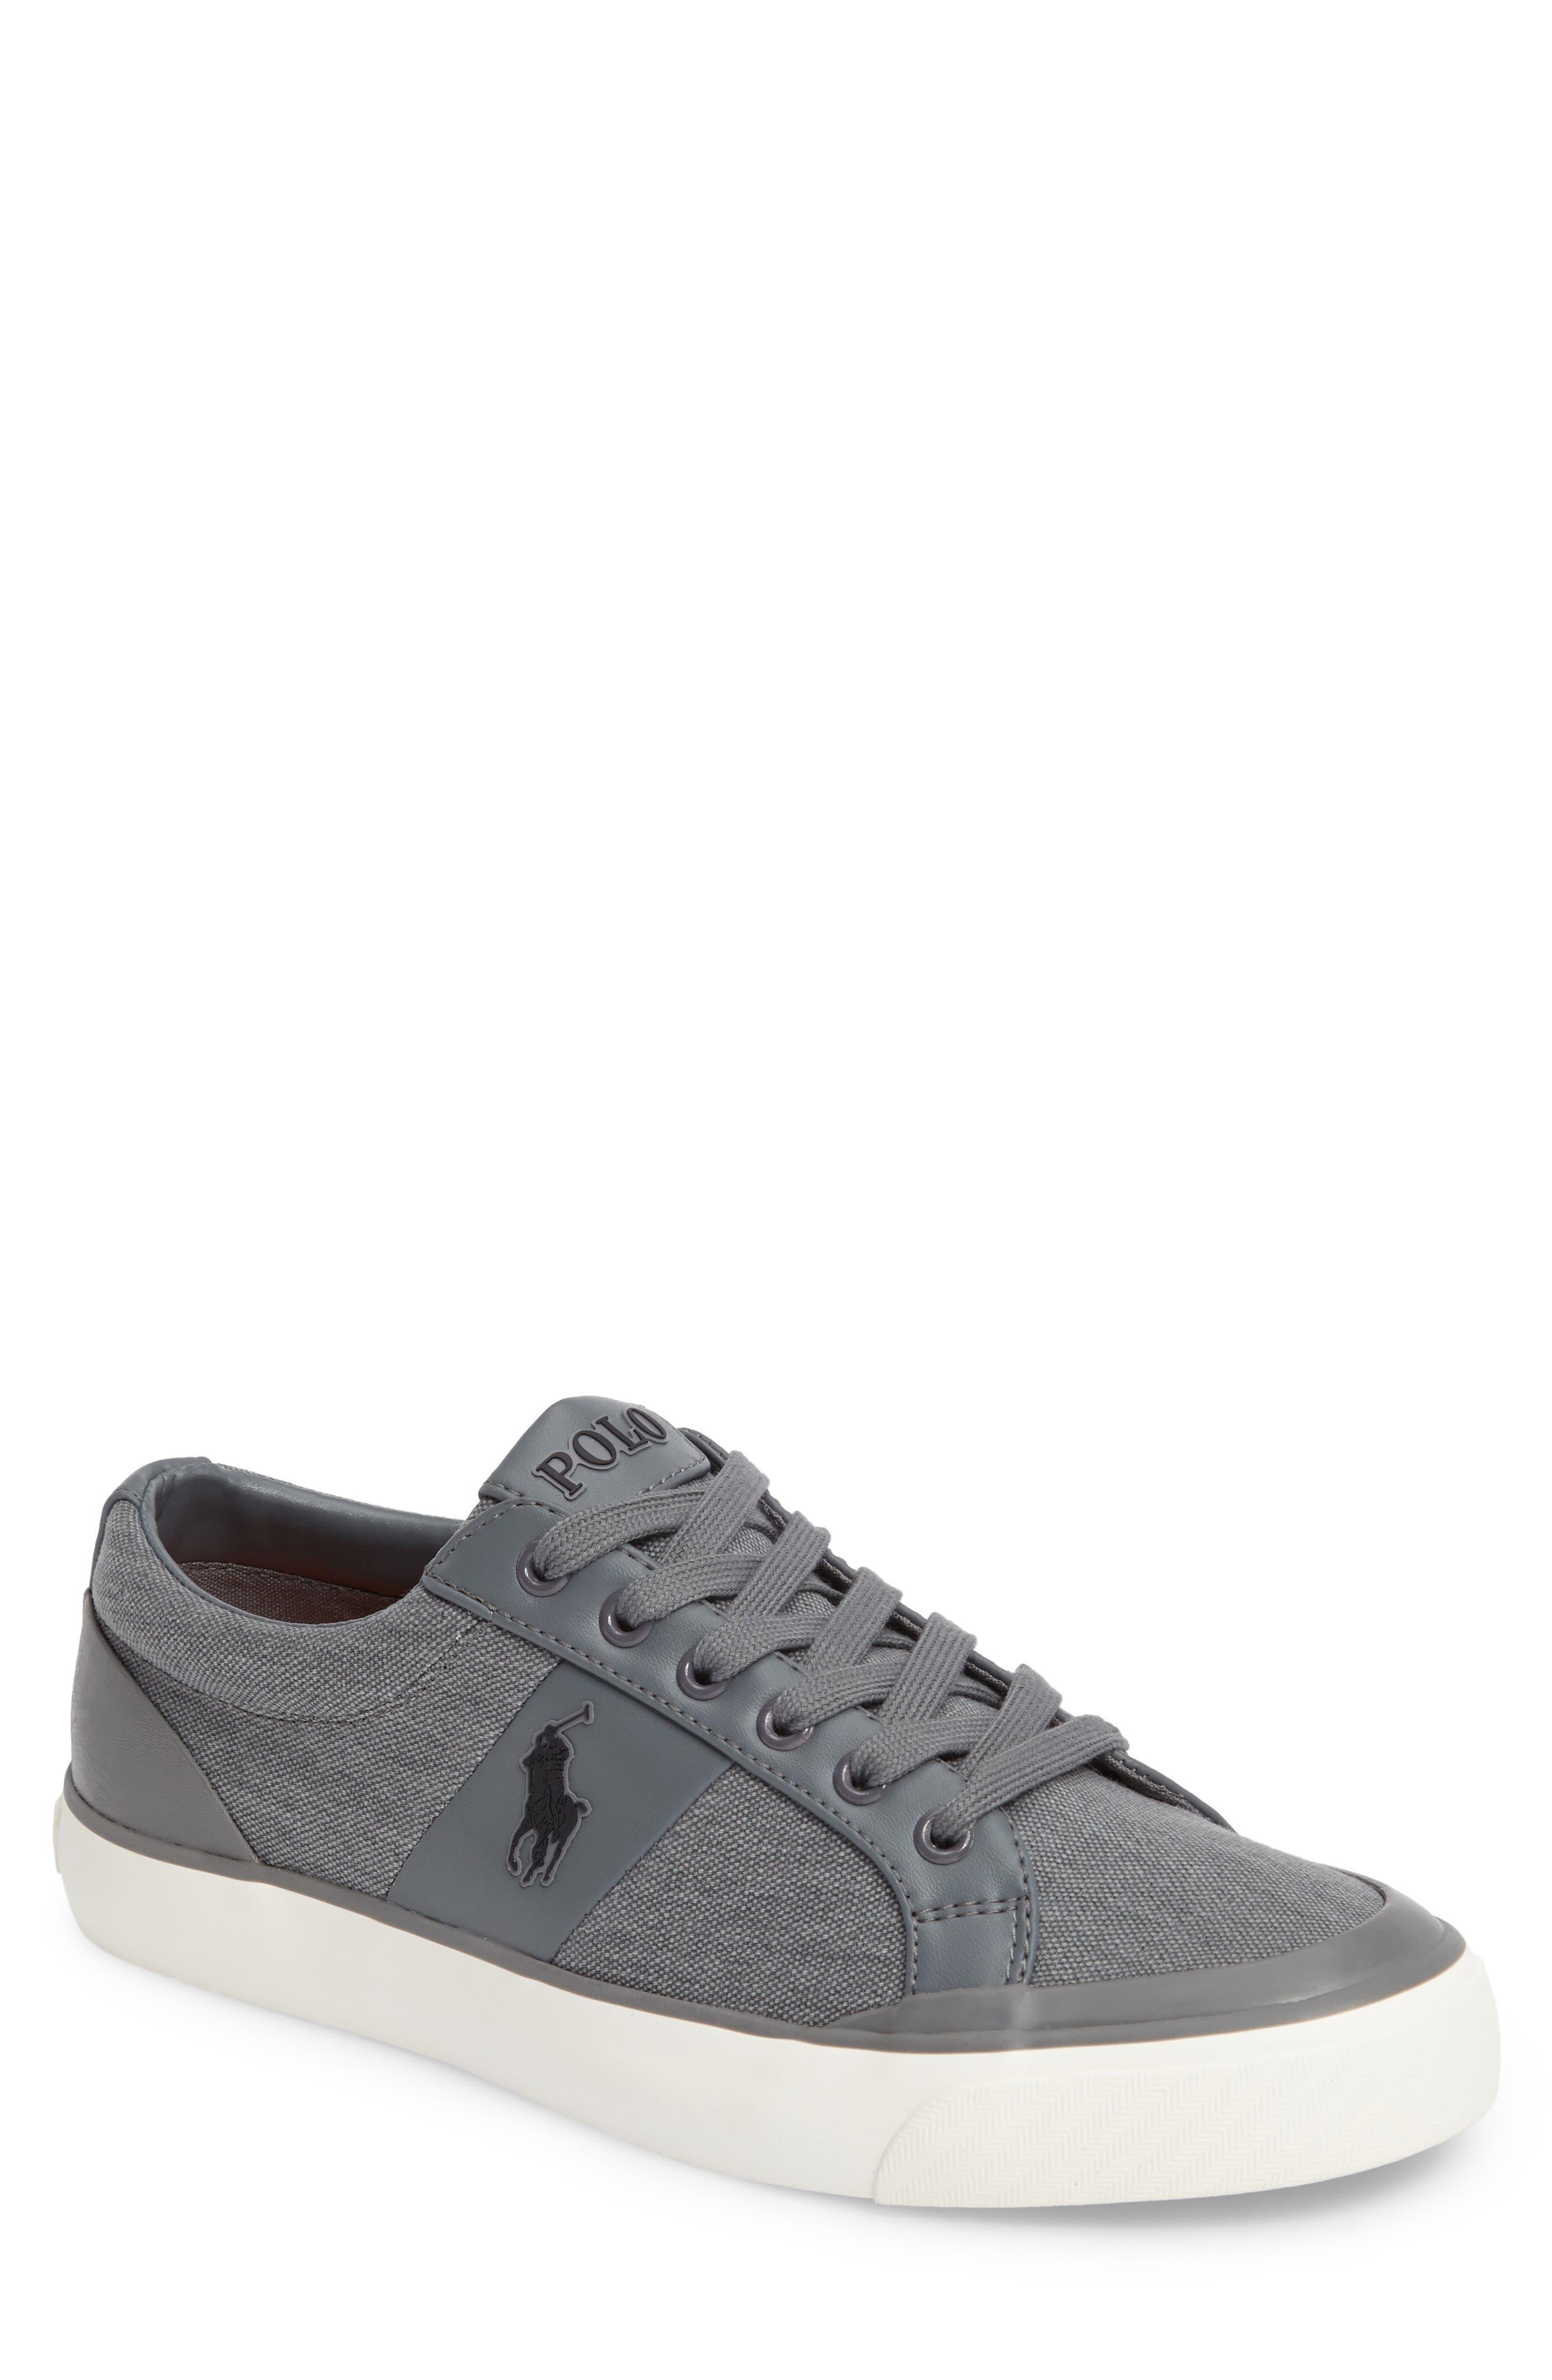 Polo Ralph Lauren Ian Sneaker,                             Main thumbnail 1, color,